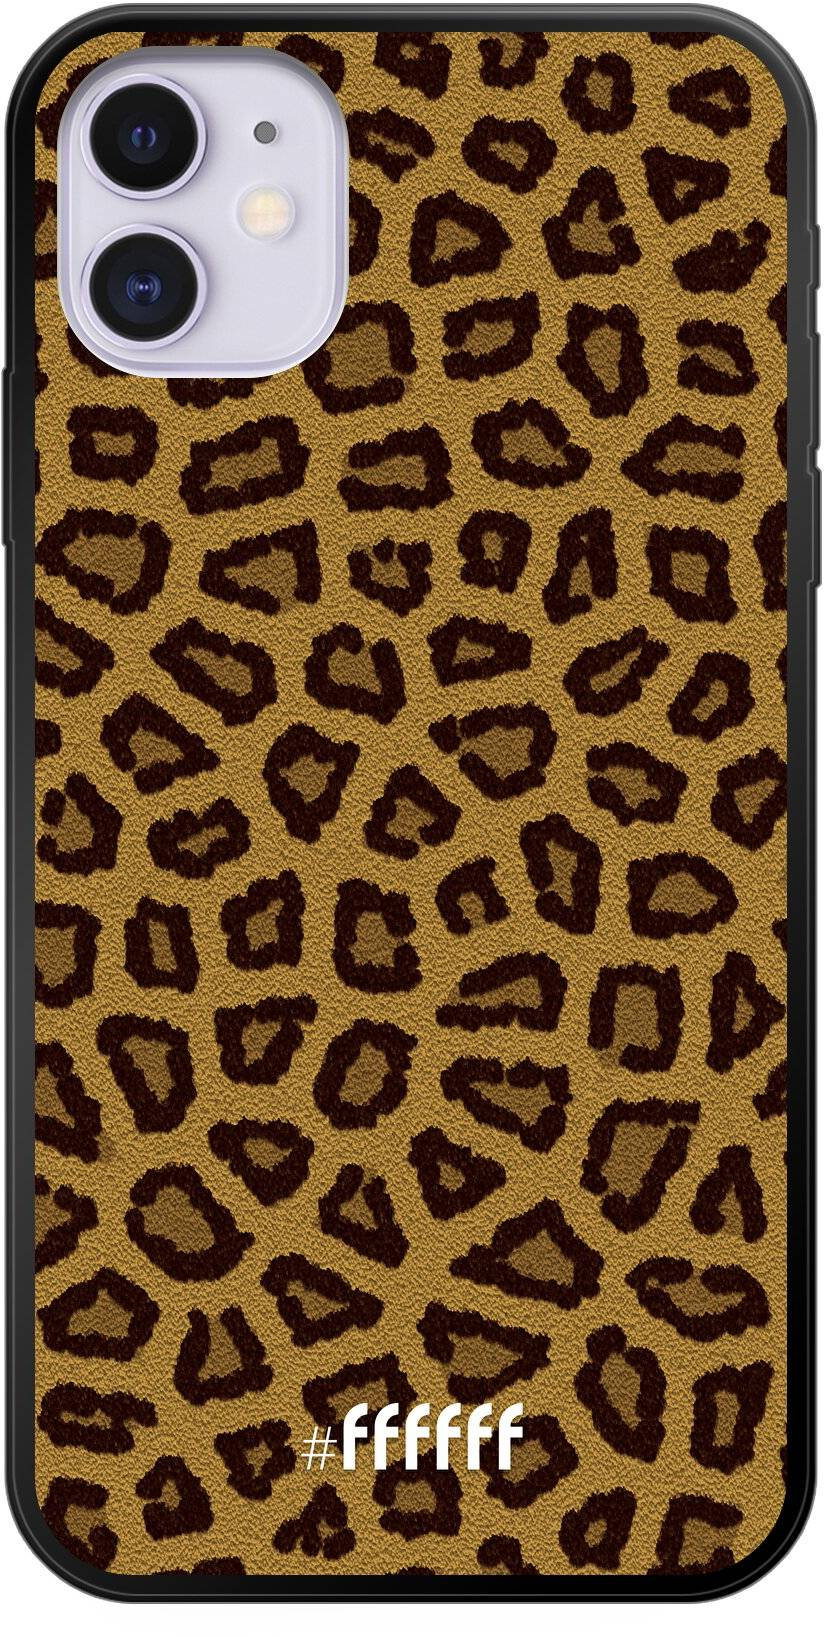 Leopard Print iPhone 11